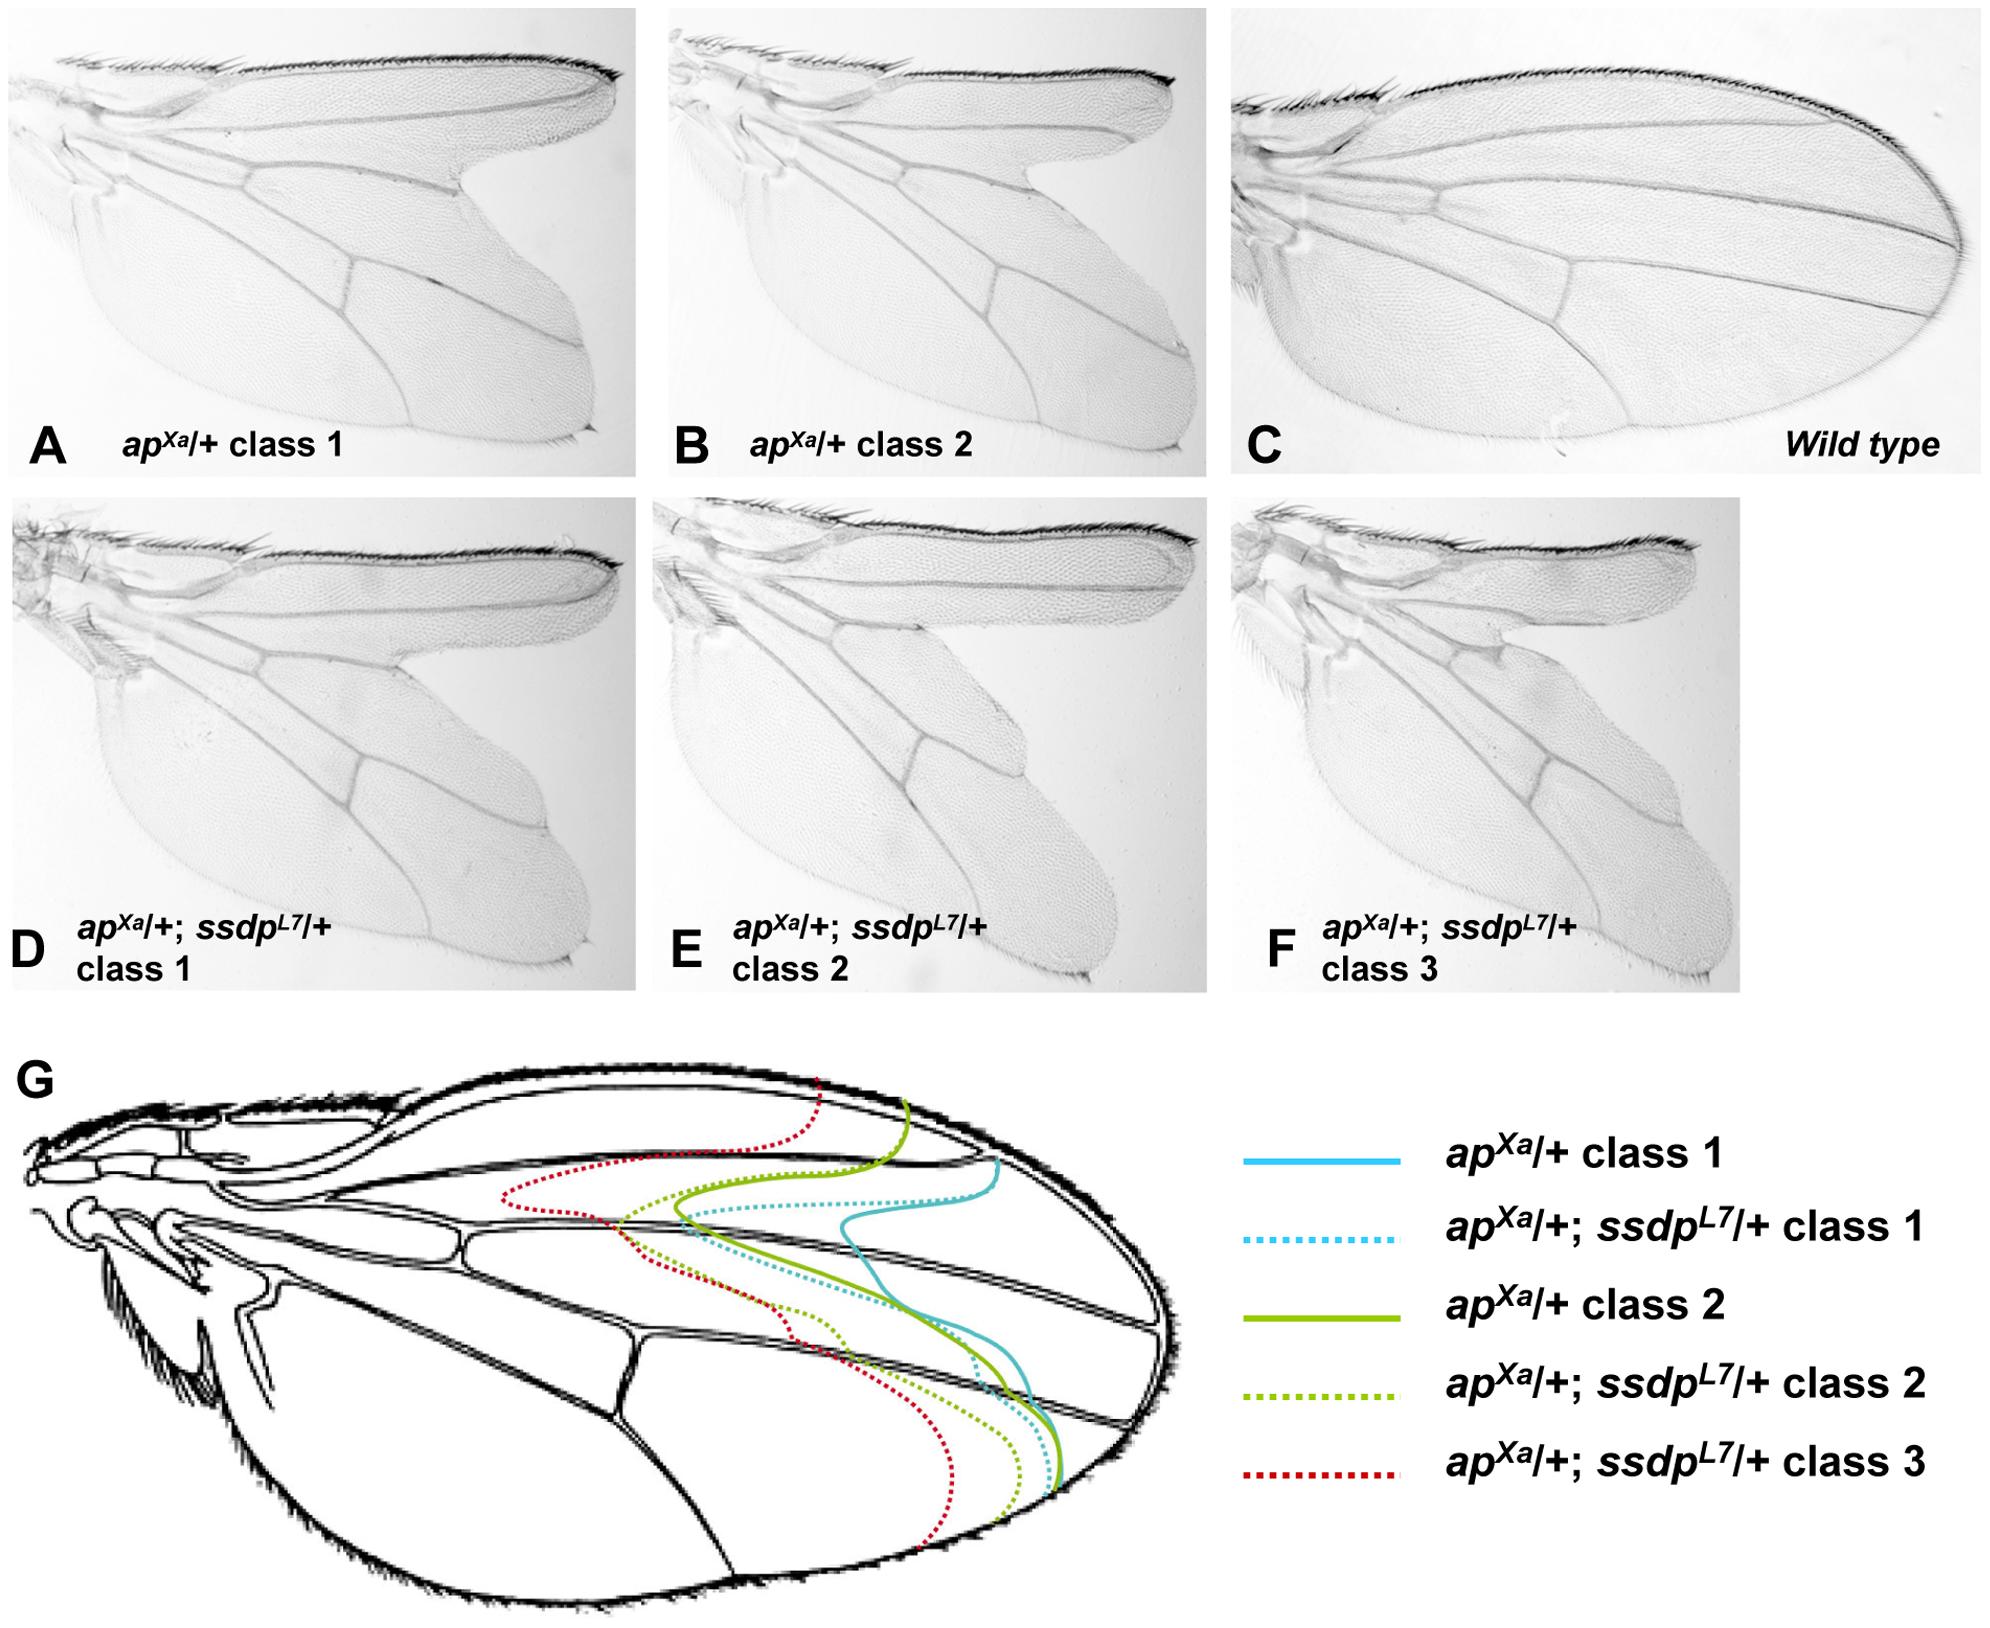 Genetic interaction between <i>ap<sup>Xa</sup></i> and <i>ssdp<sup>L7</sup></i>.